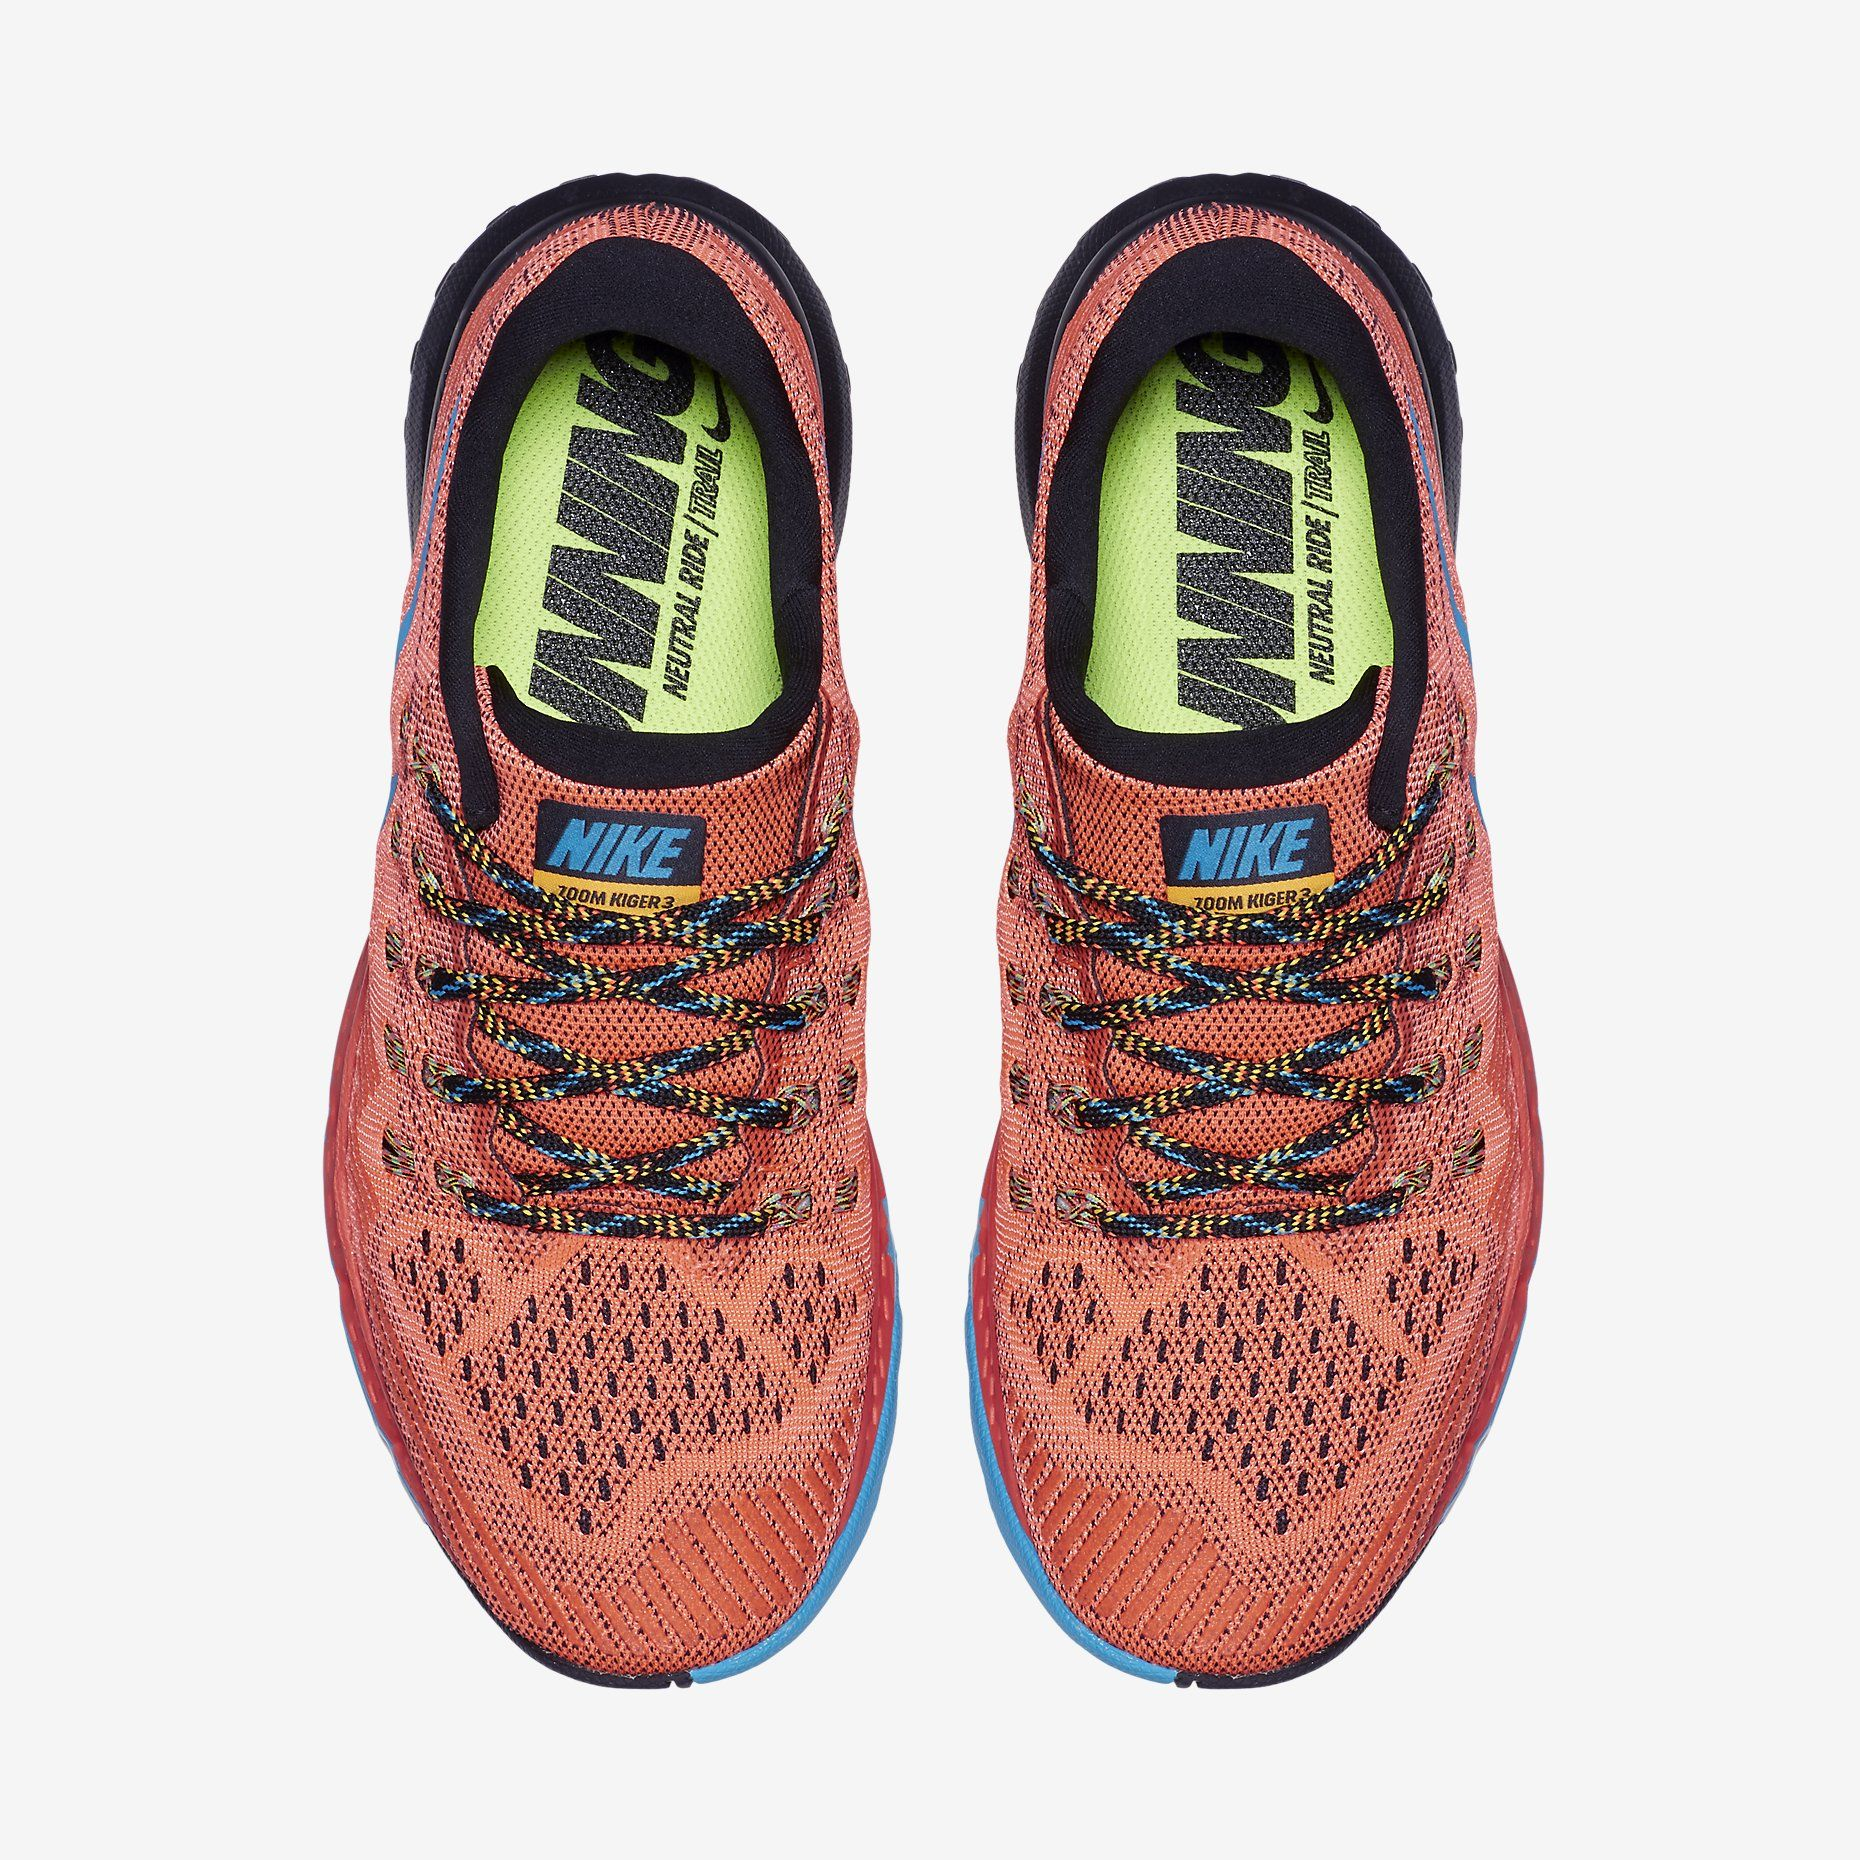 new styles c6221 7bbab Nike Air Zoom Terra Kiger 3 Womens Running Shoe. Nike.com